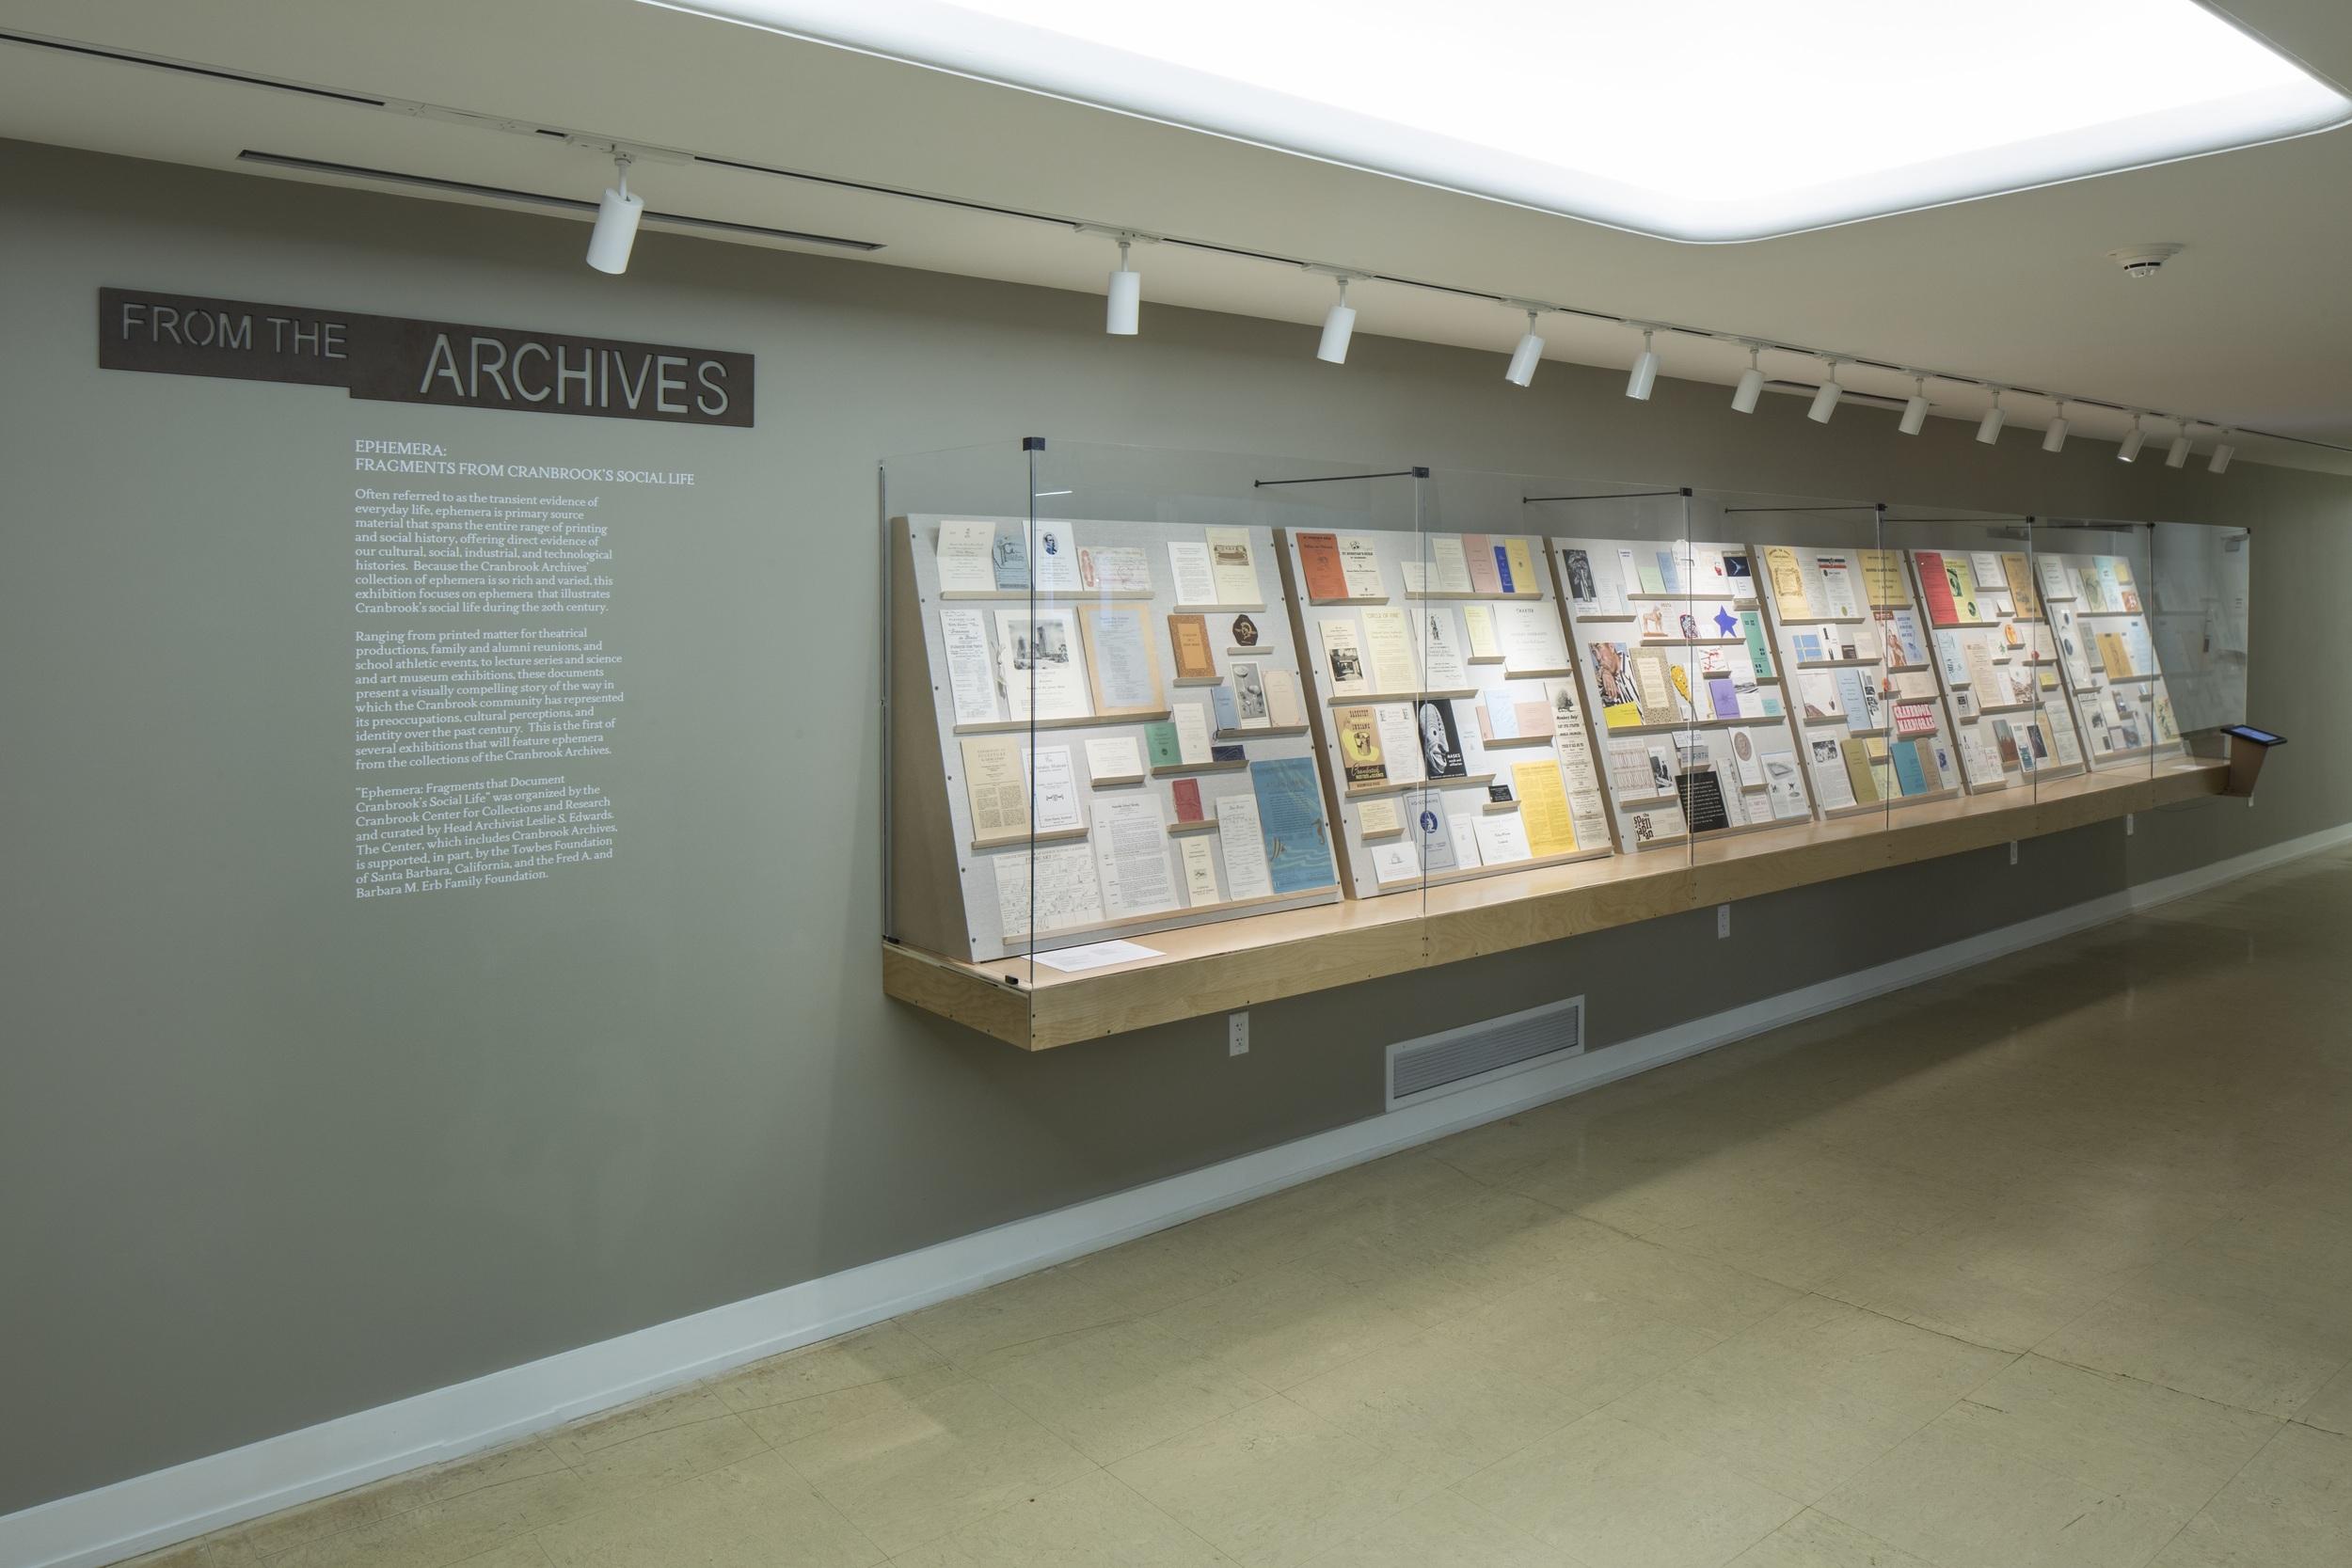 EPHEMERA: FRAGMENTS FROM CRANBROOK'S SOCIAL LIFE   Cranbrook Art Museum June 2014 - September 2014 Photo: R.H. Hensleigh